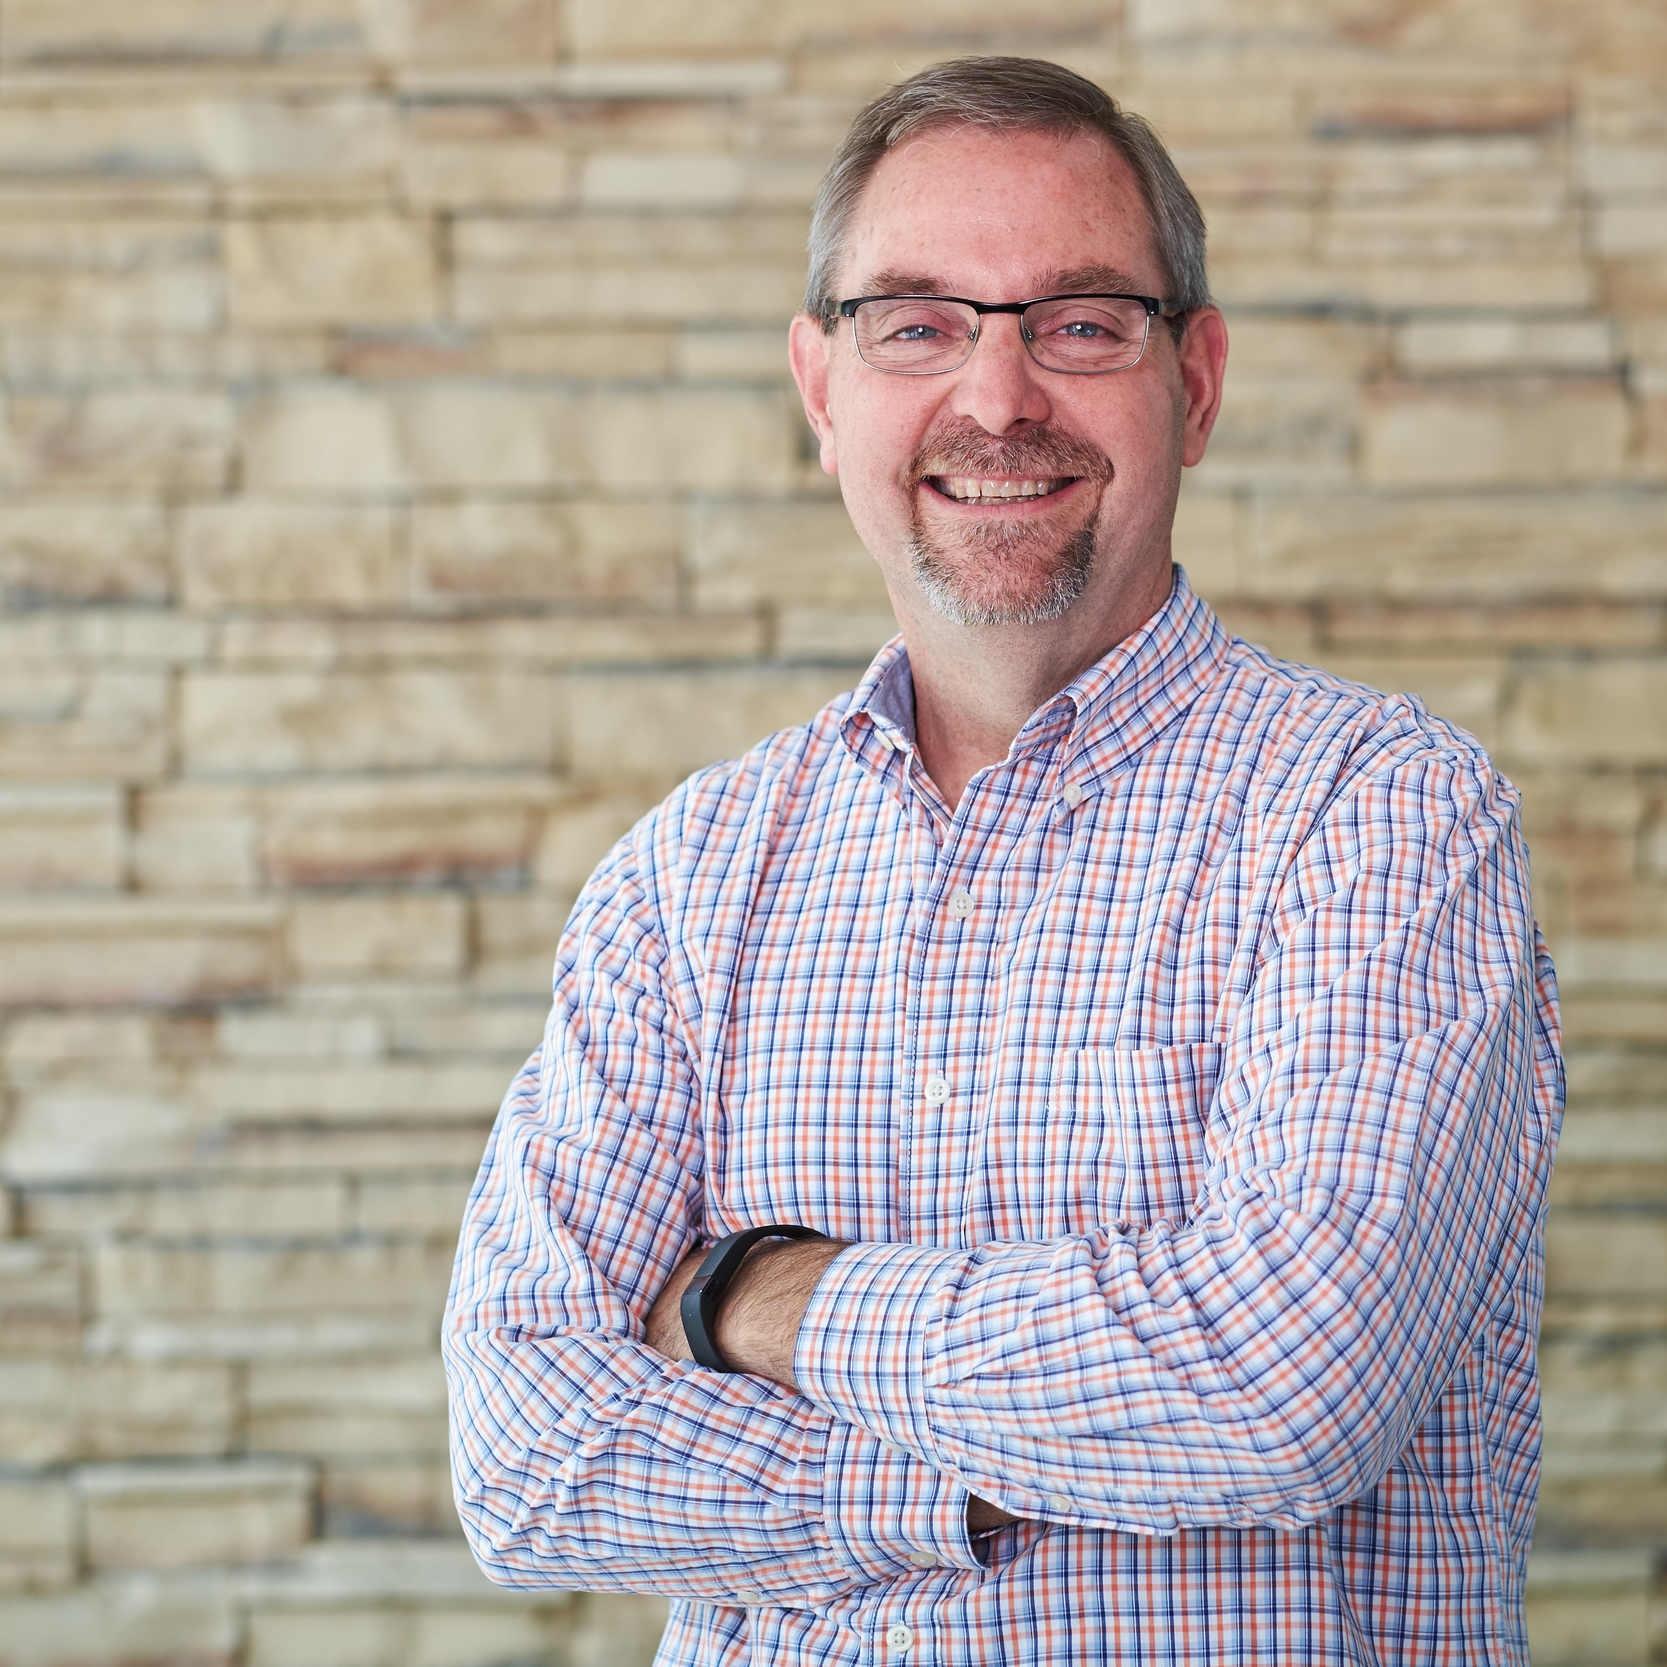 Greg Pickering - Founding & Lead Pastor